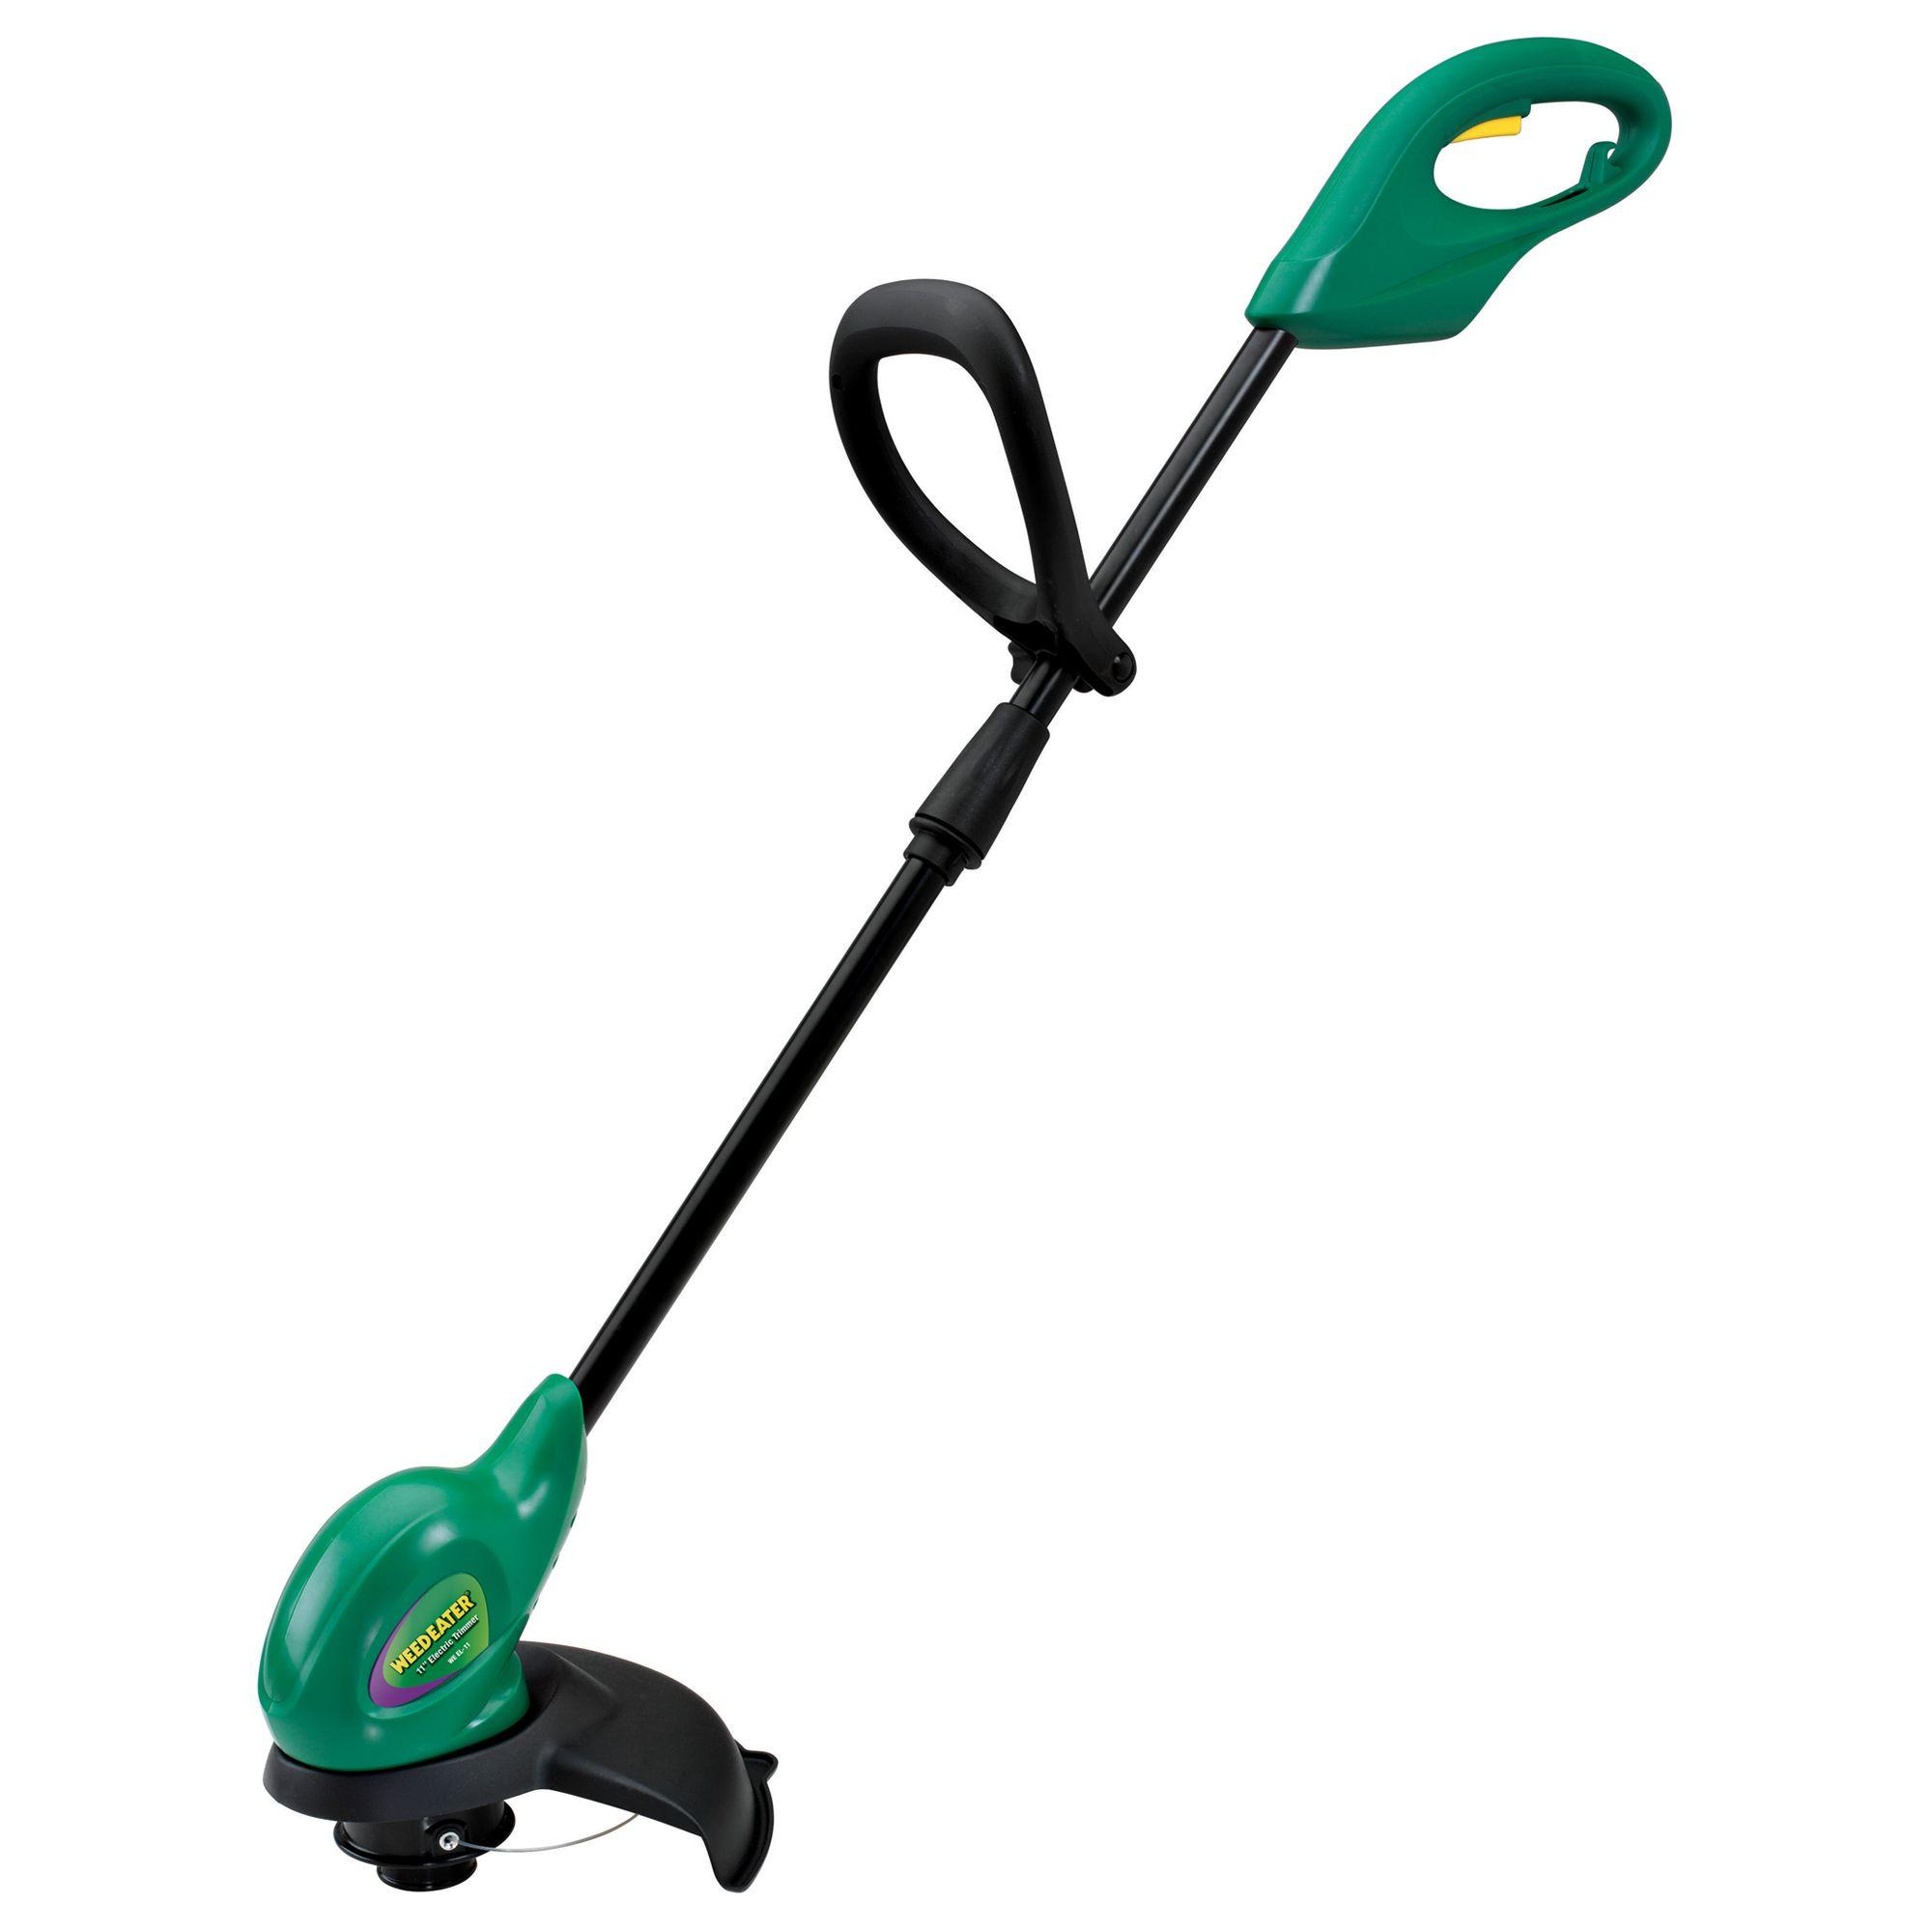 Lawn EquipmentGet Lawn And Garden Essentials at Kmart